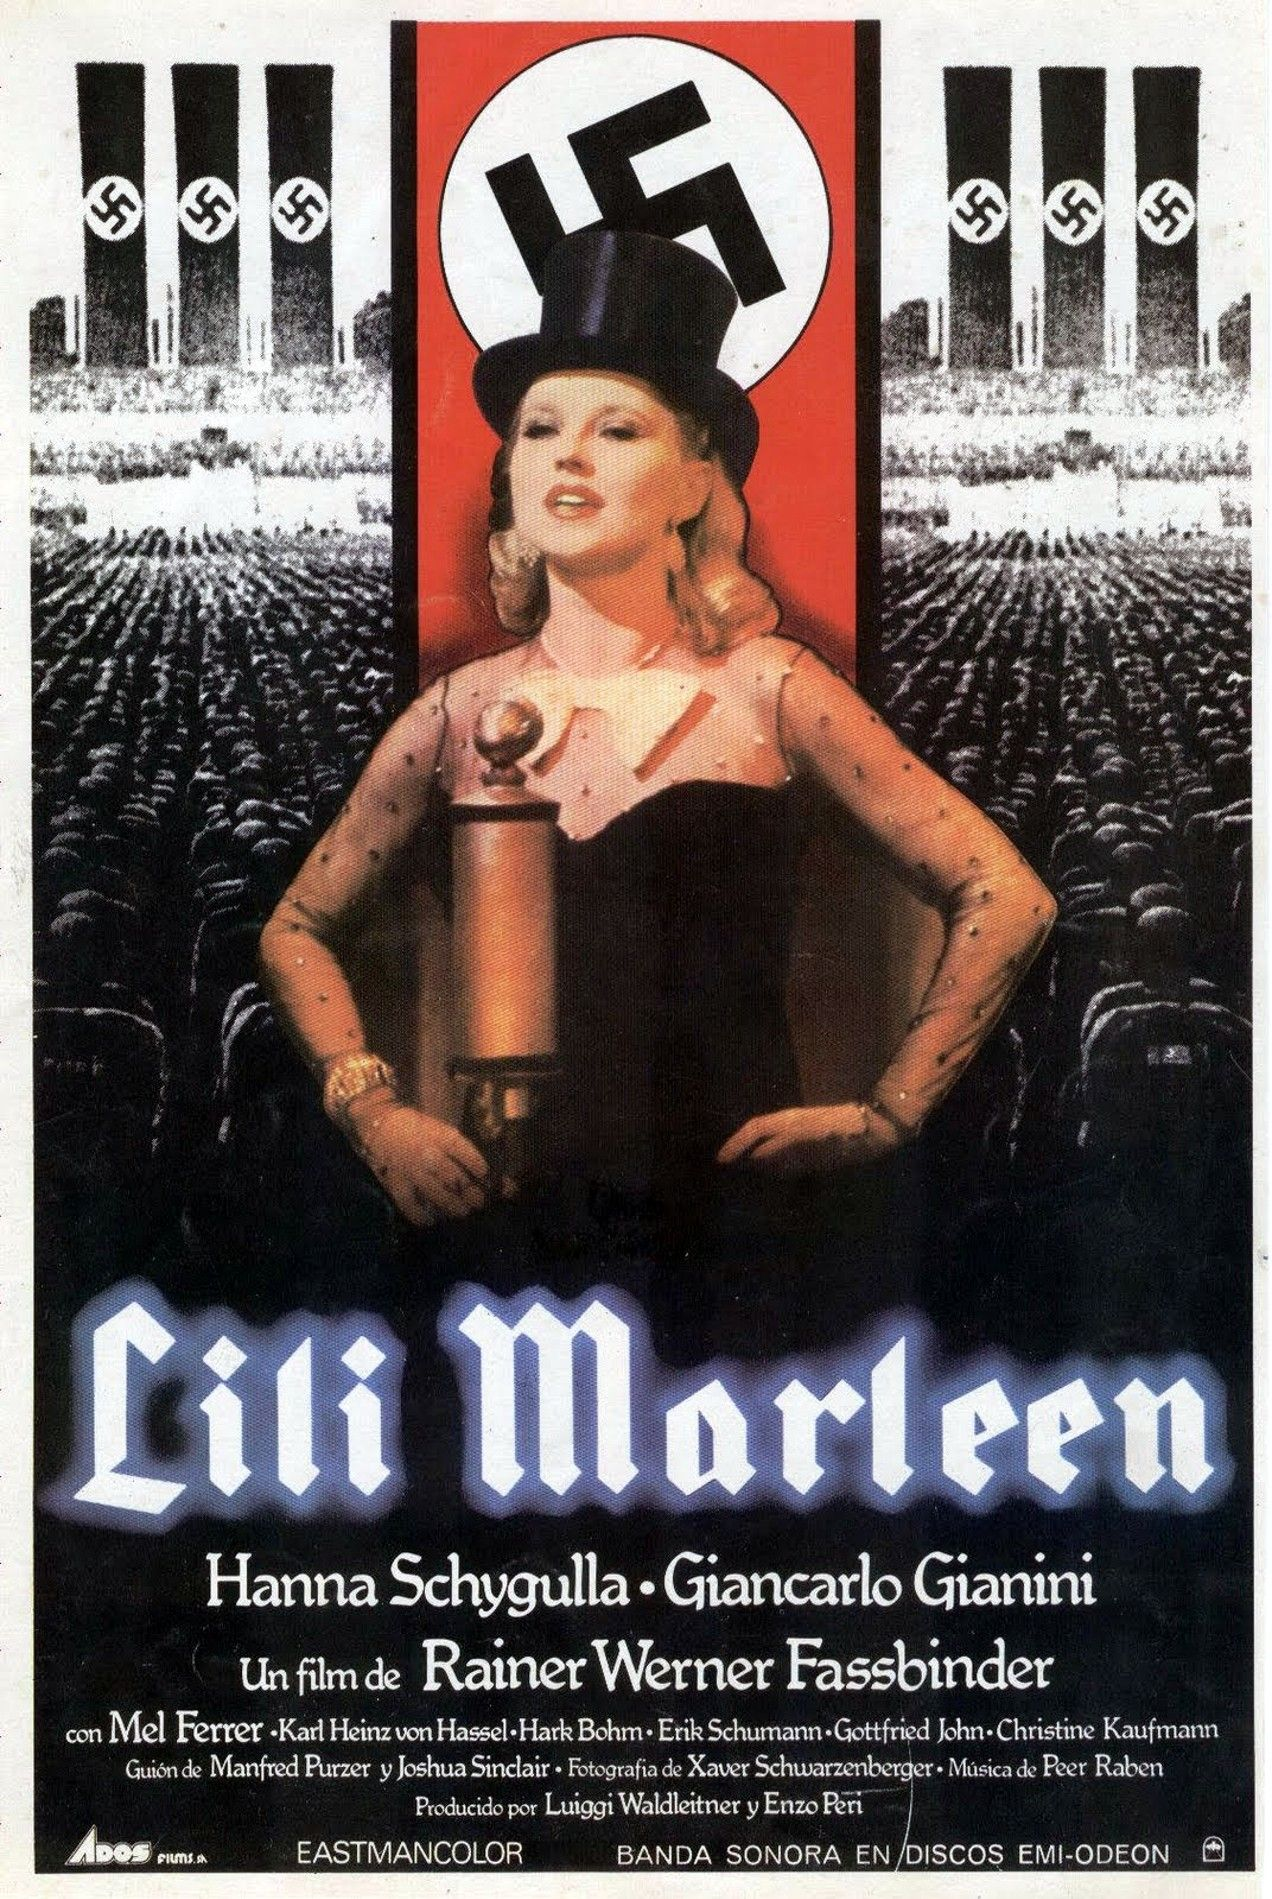 'Lili Marleen' (1981) | Films | Film, Cine cinema et Lili ...